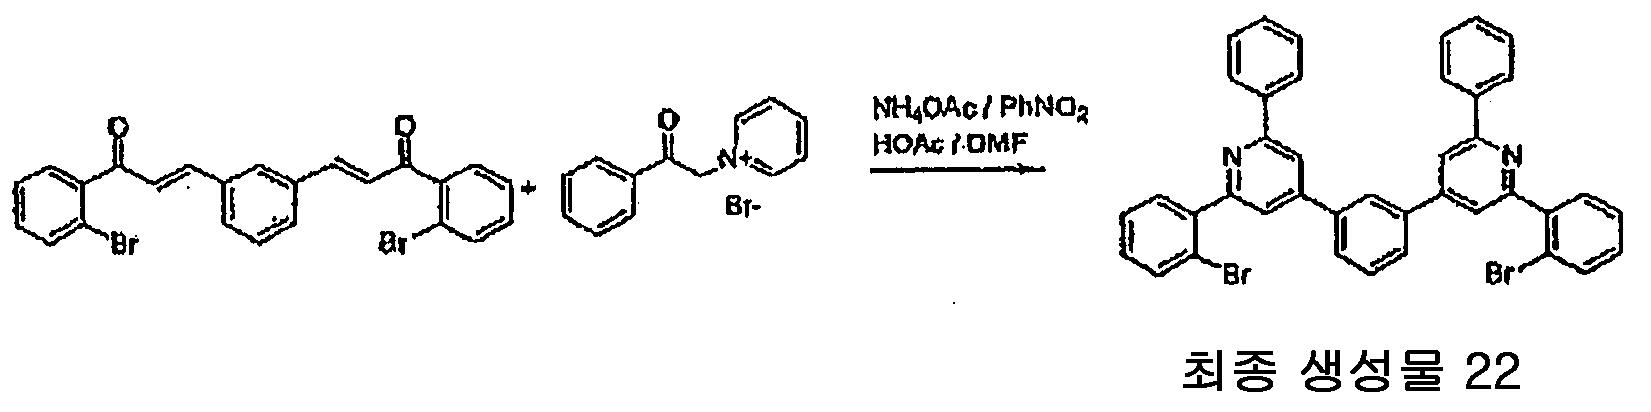 Figure 112010002231902-pat00117